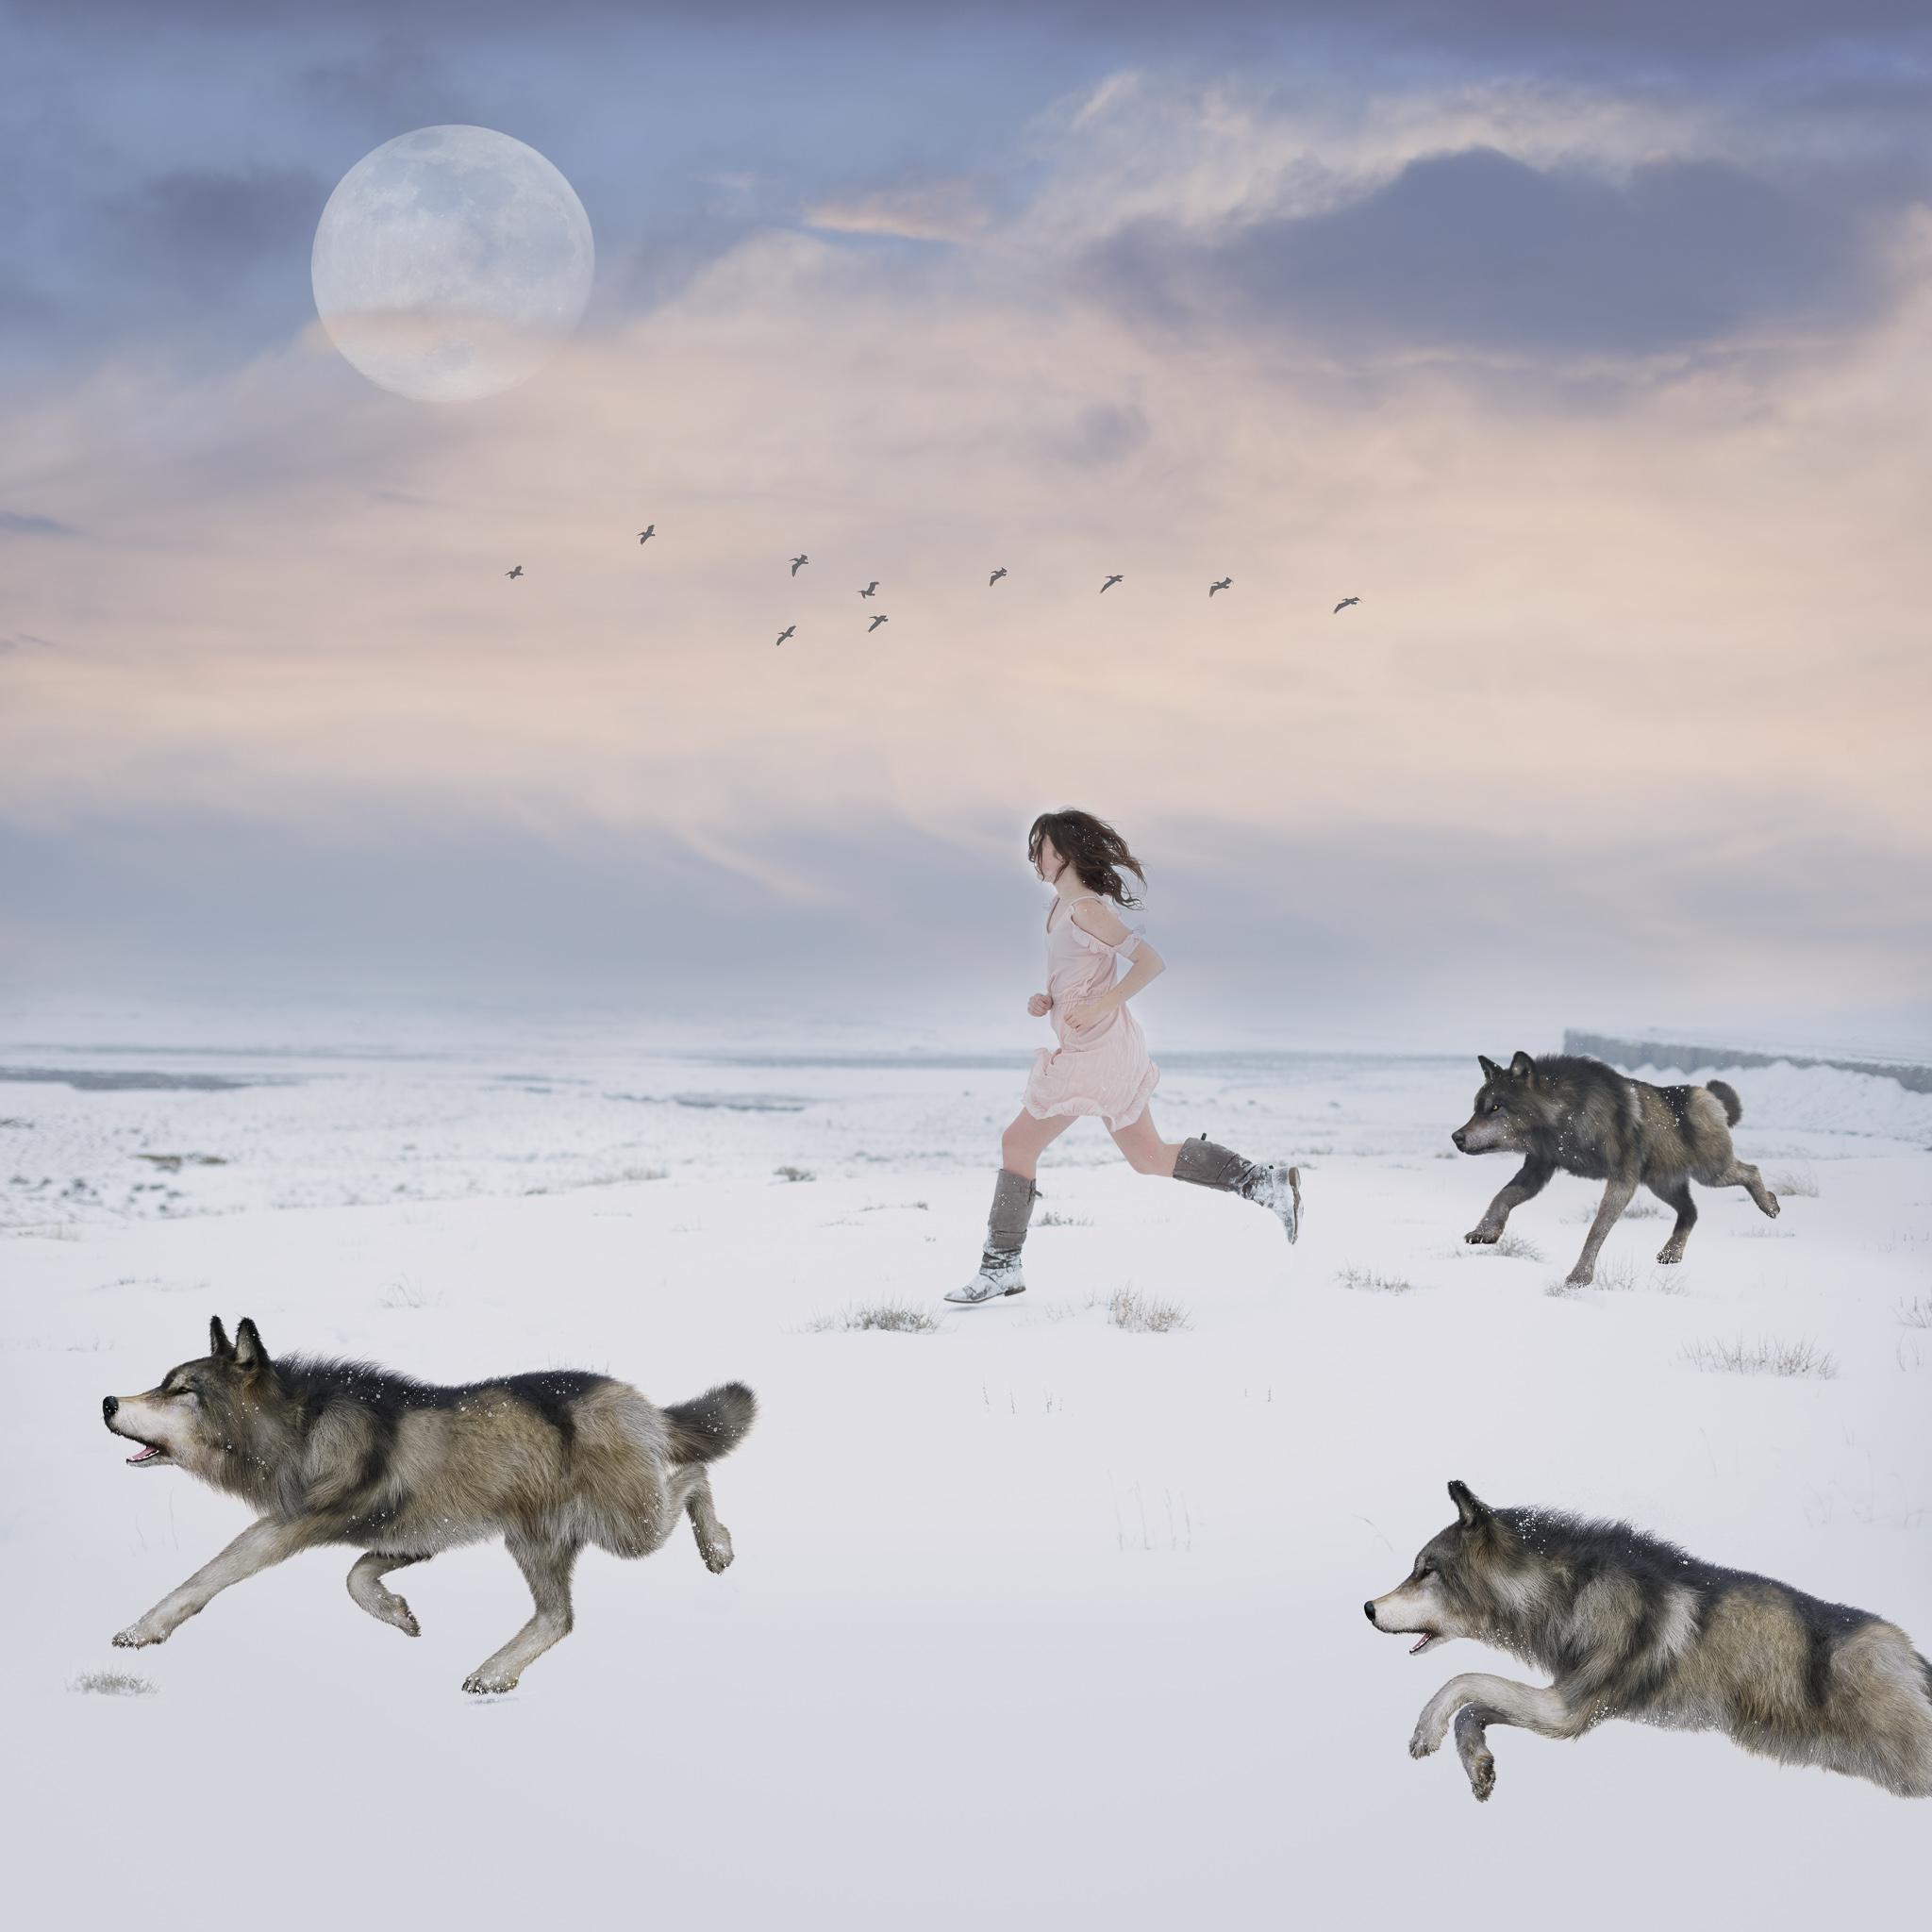 kloeandwolves3-Edit-3.jpg